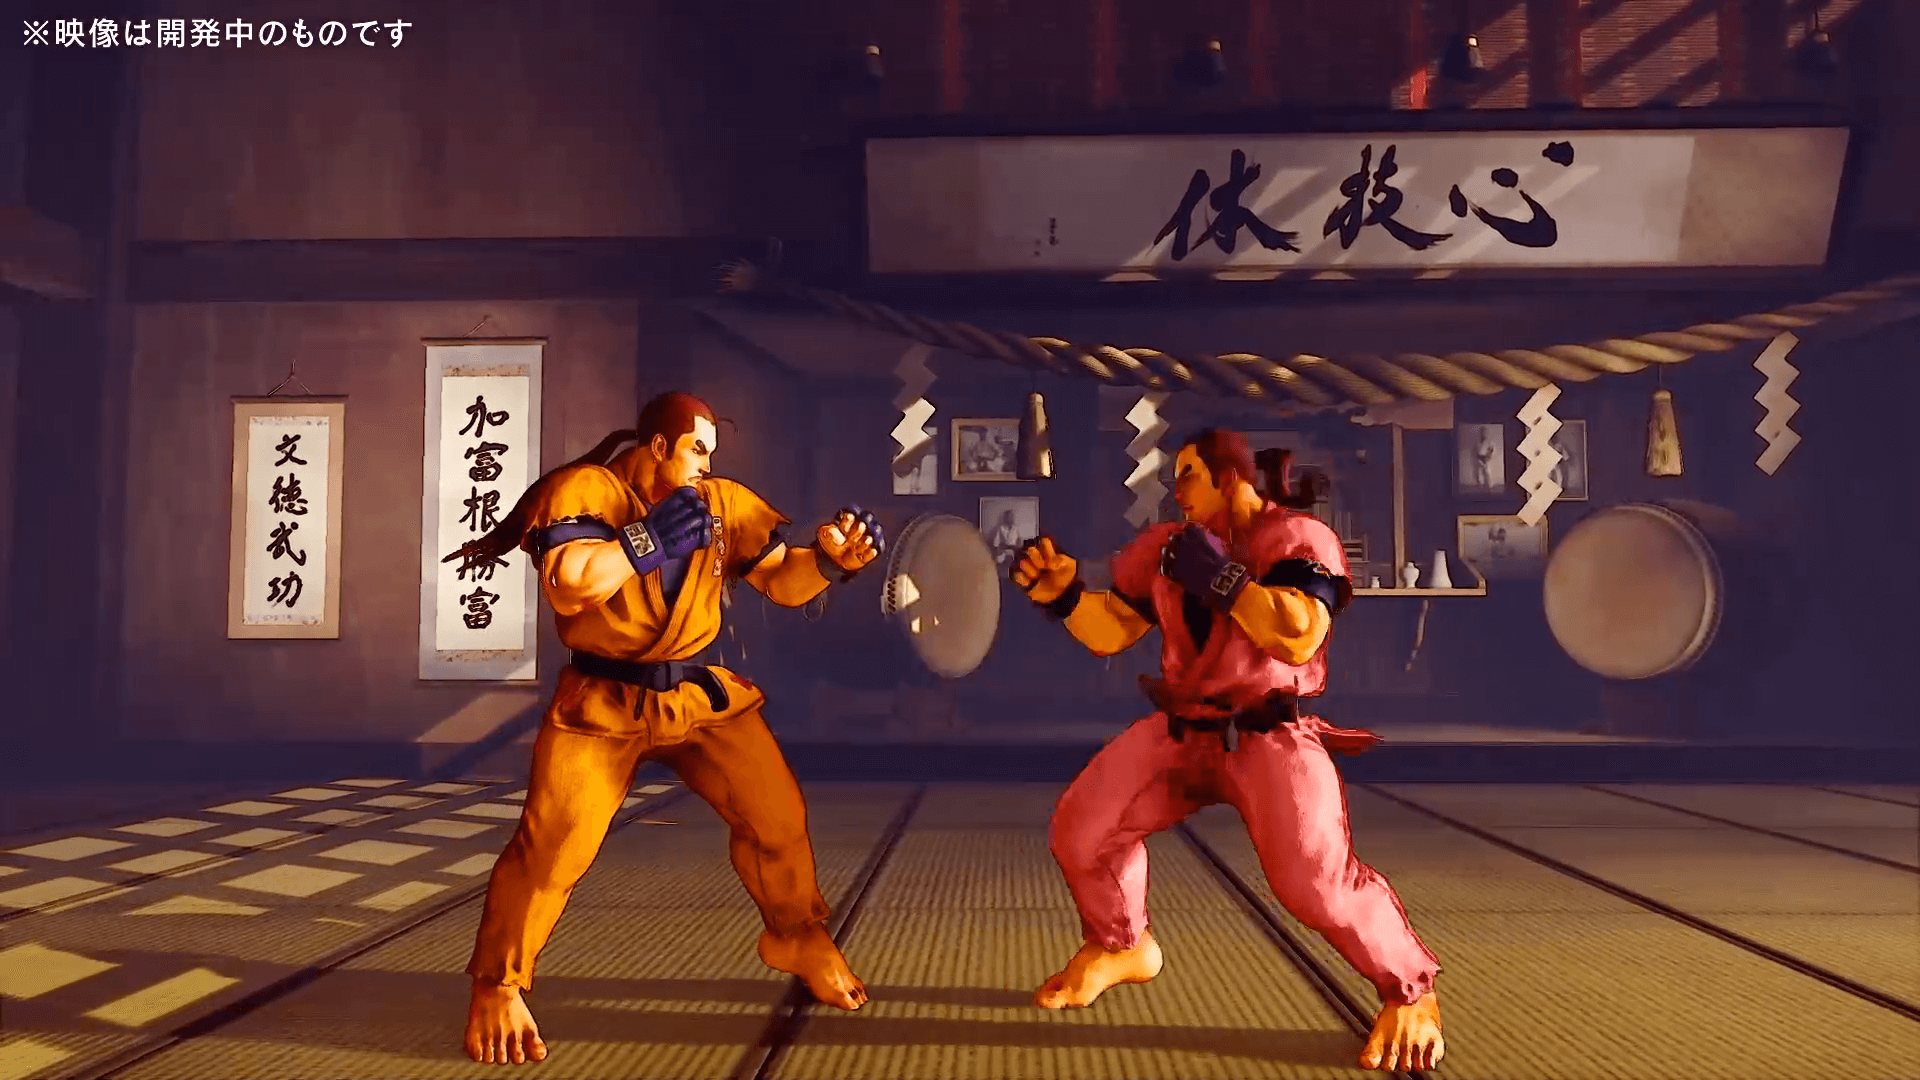 Capcom Reveals More Info on SFV Dan Hibiki During TGS Live 2020